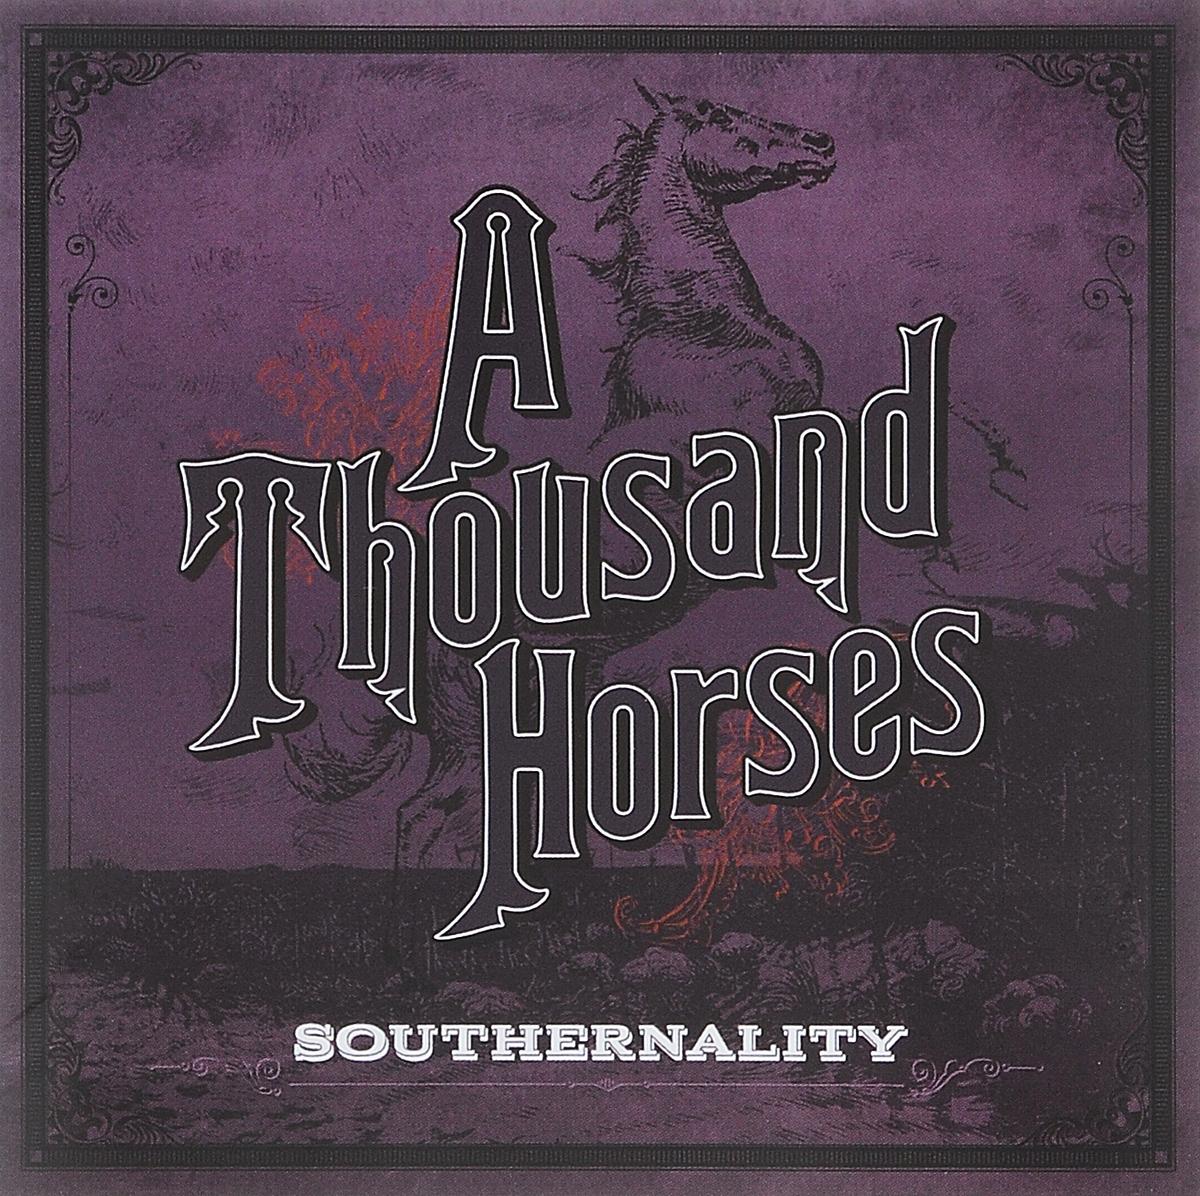 A Thousand Horses A Thousand Horses. Southernality horses